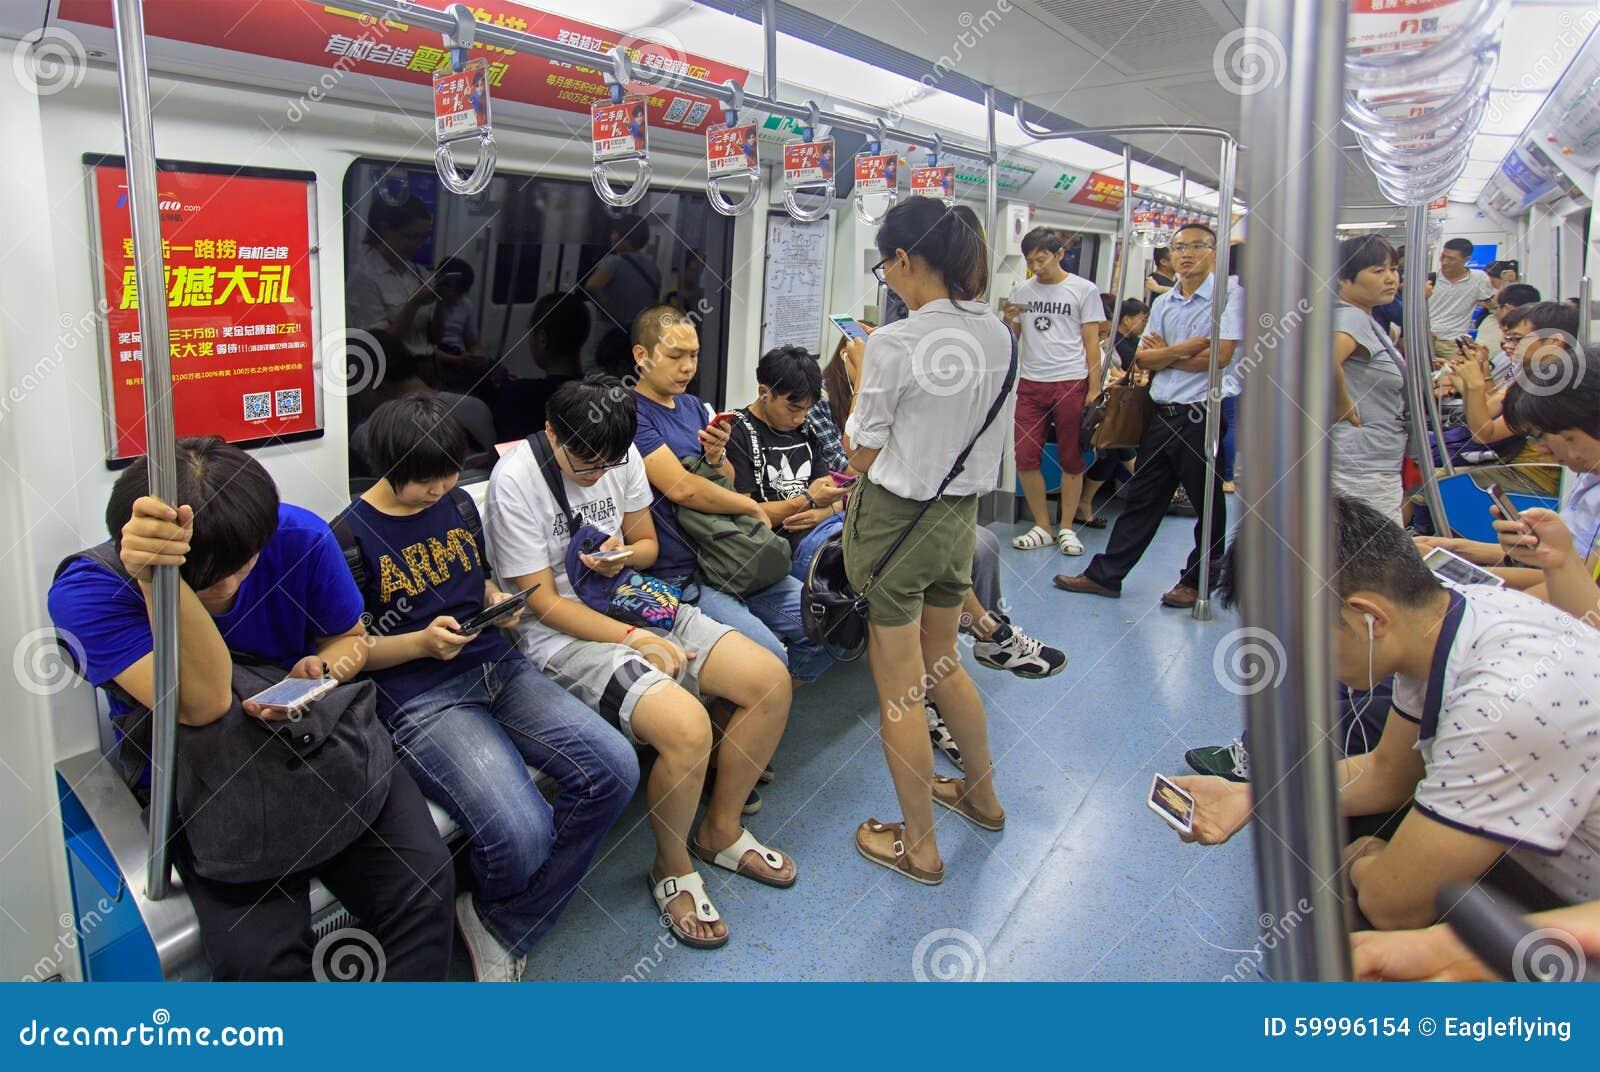 Public Transportation In China